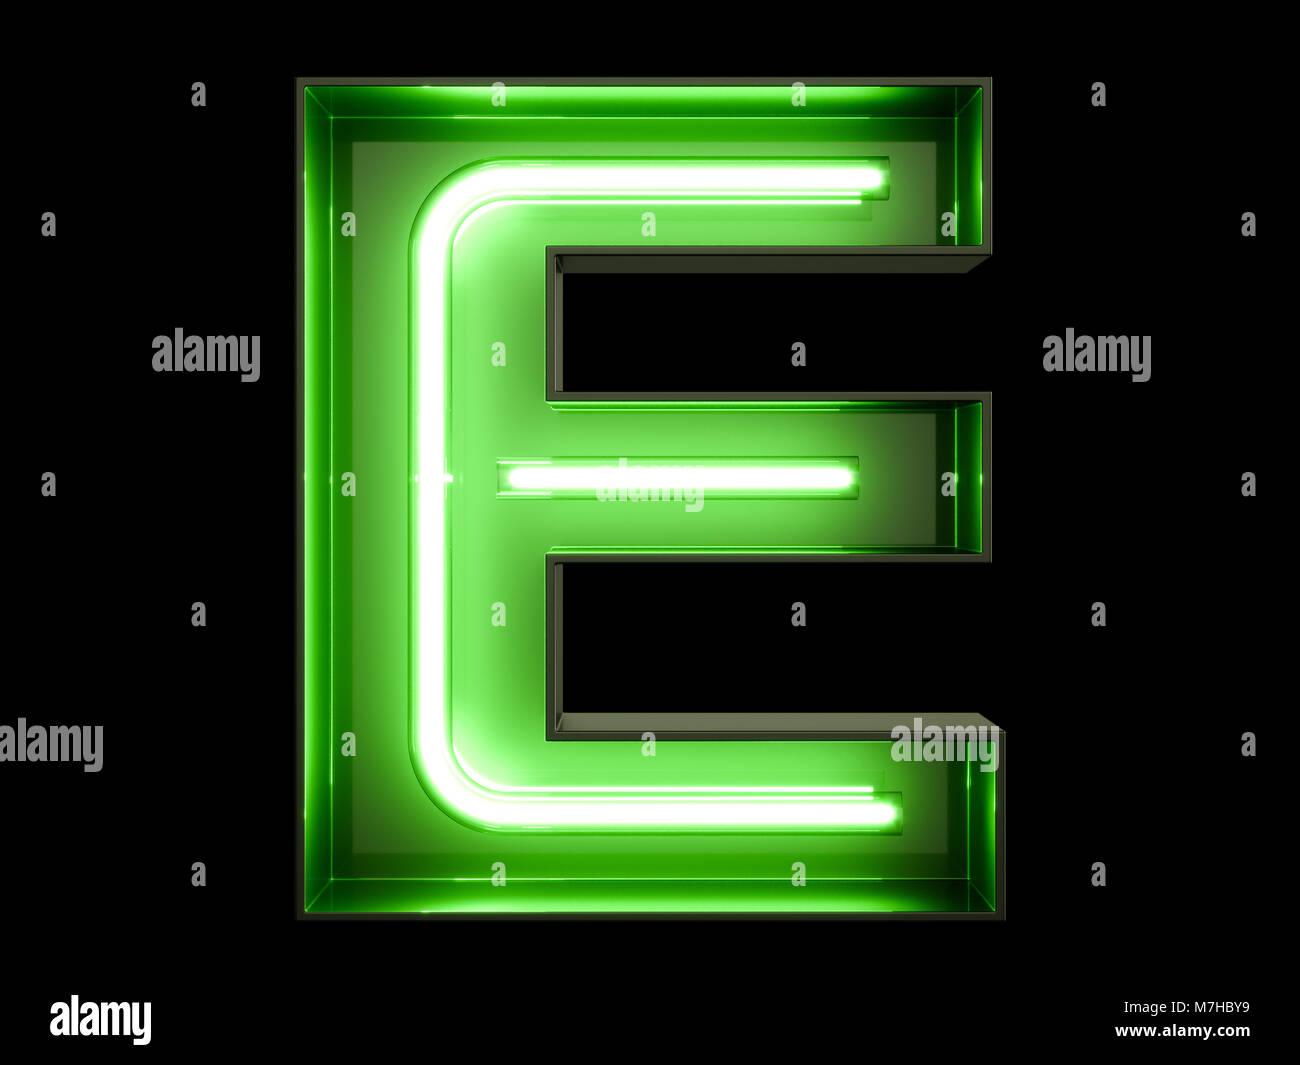 Neon Green Light Alphabet Character E Font Neon Tube Letters Glow